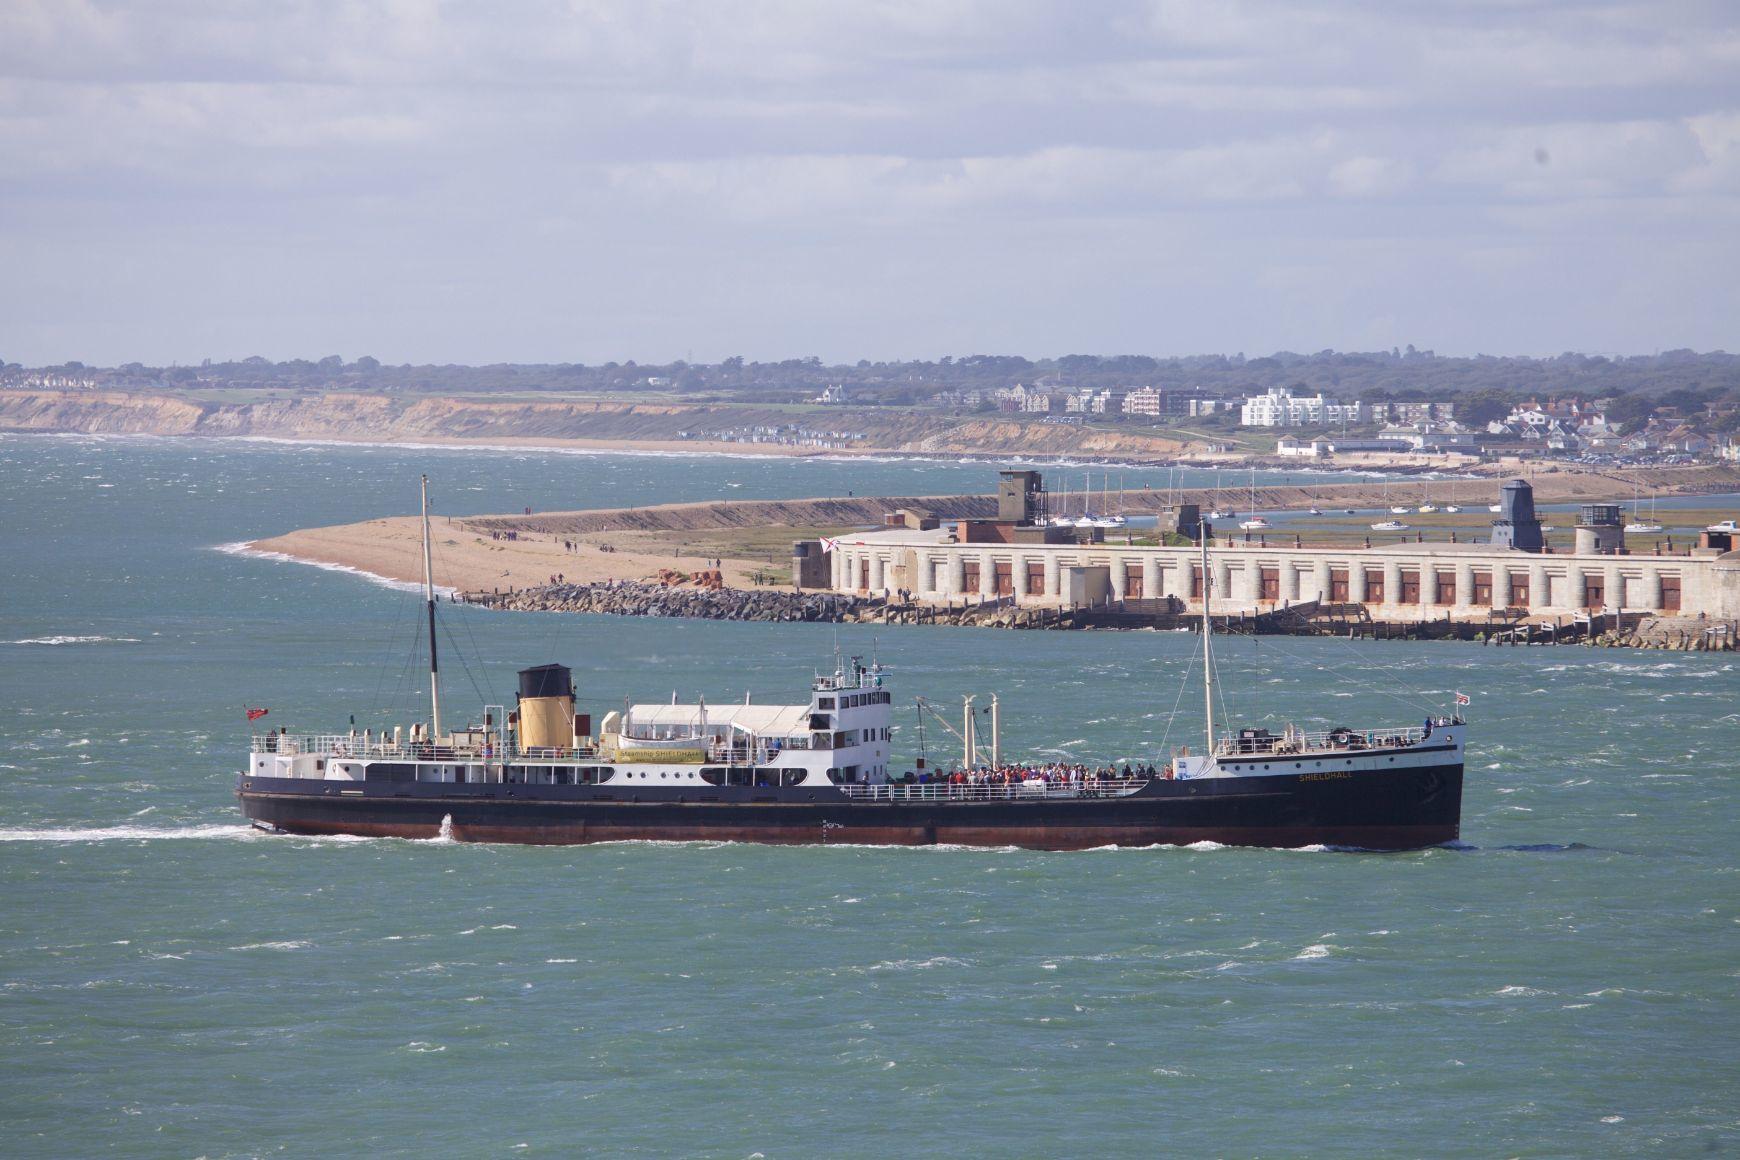 Steamship Shieldhall credit Martin Perry